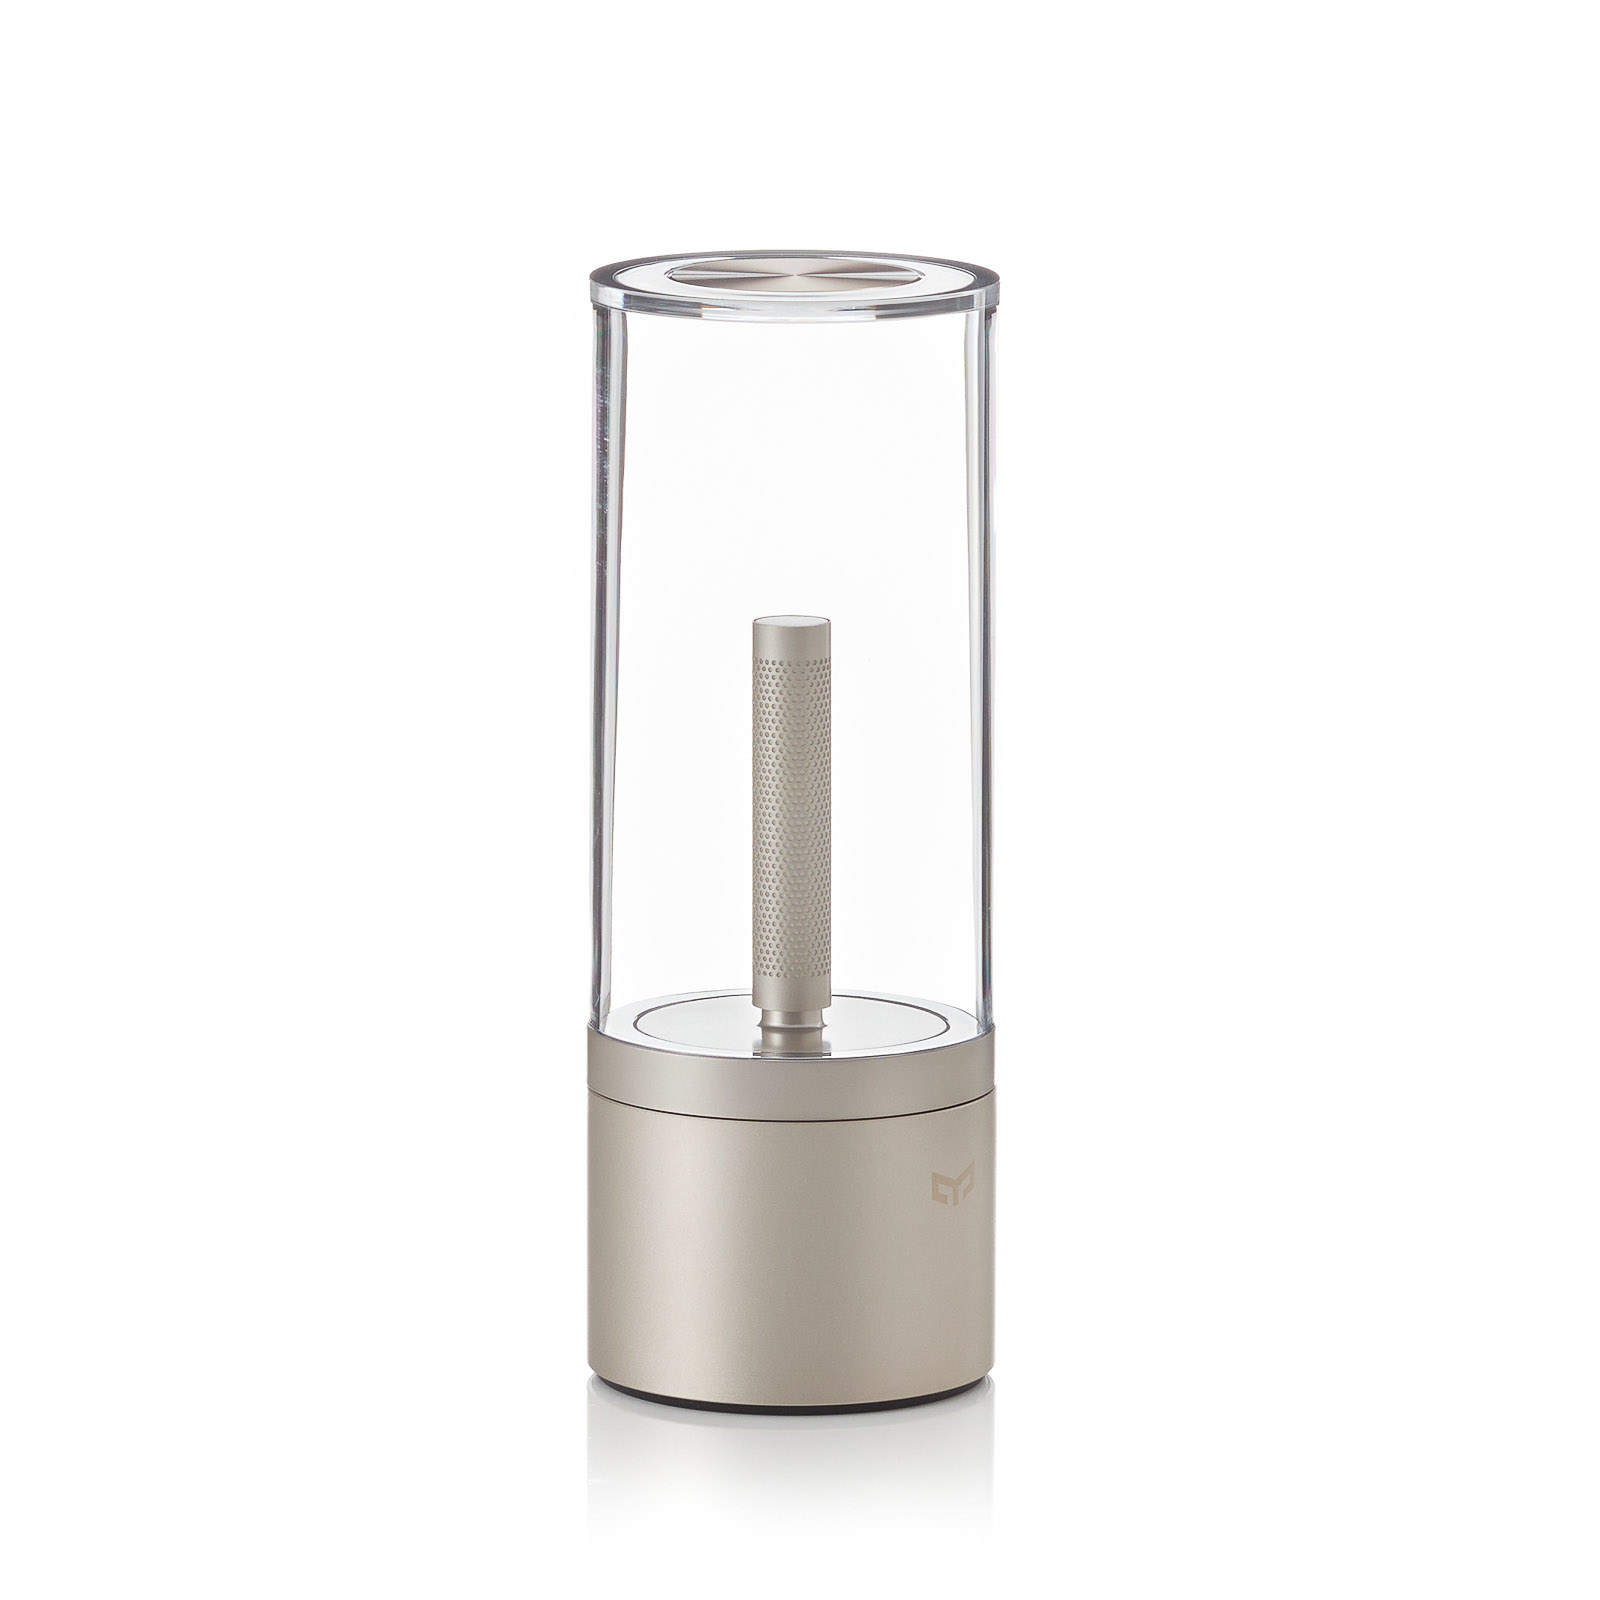 Yeelight Candela lampe ambiance batterie Bluetooth